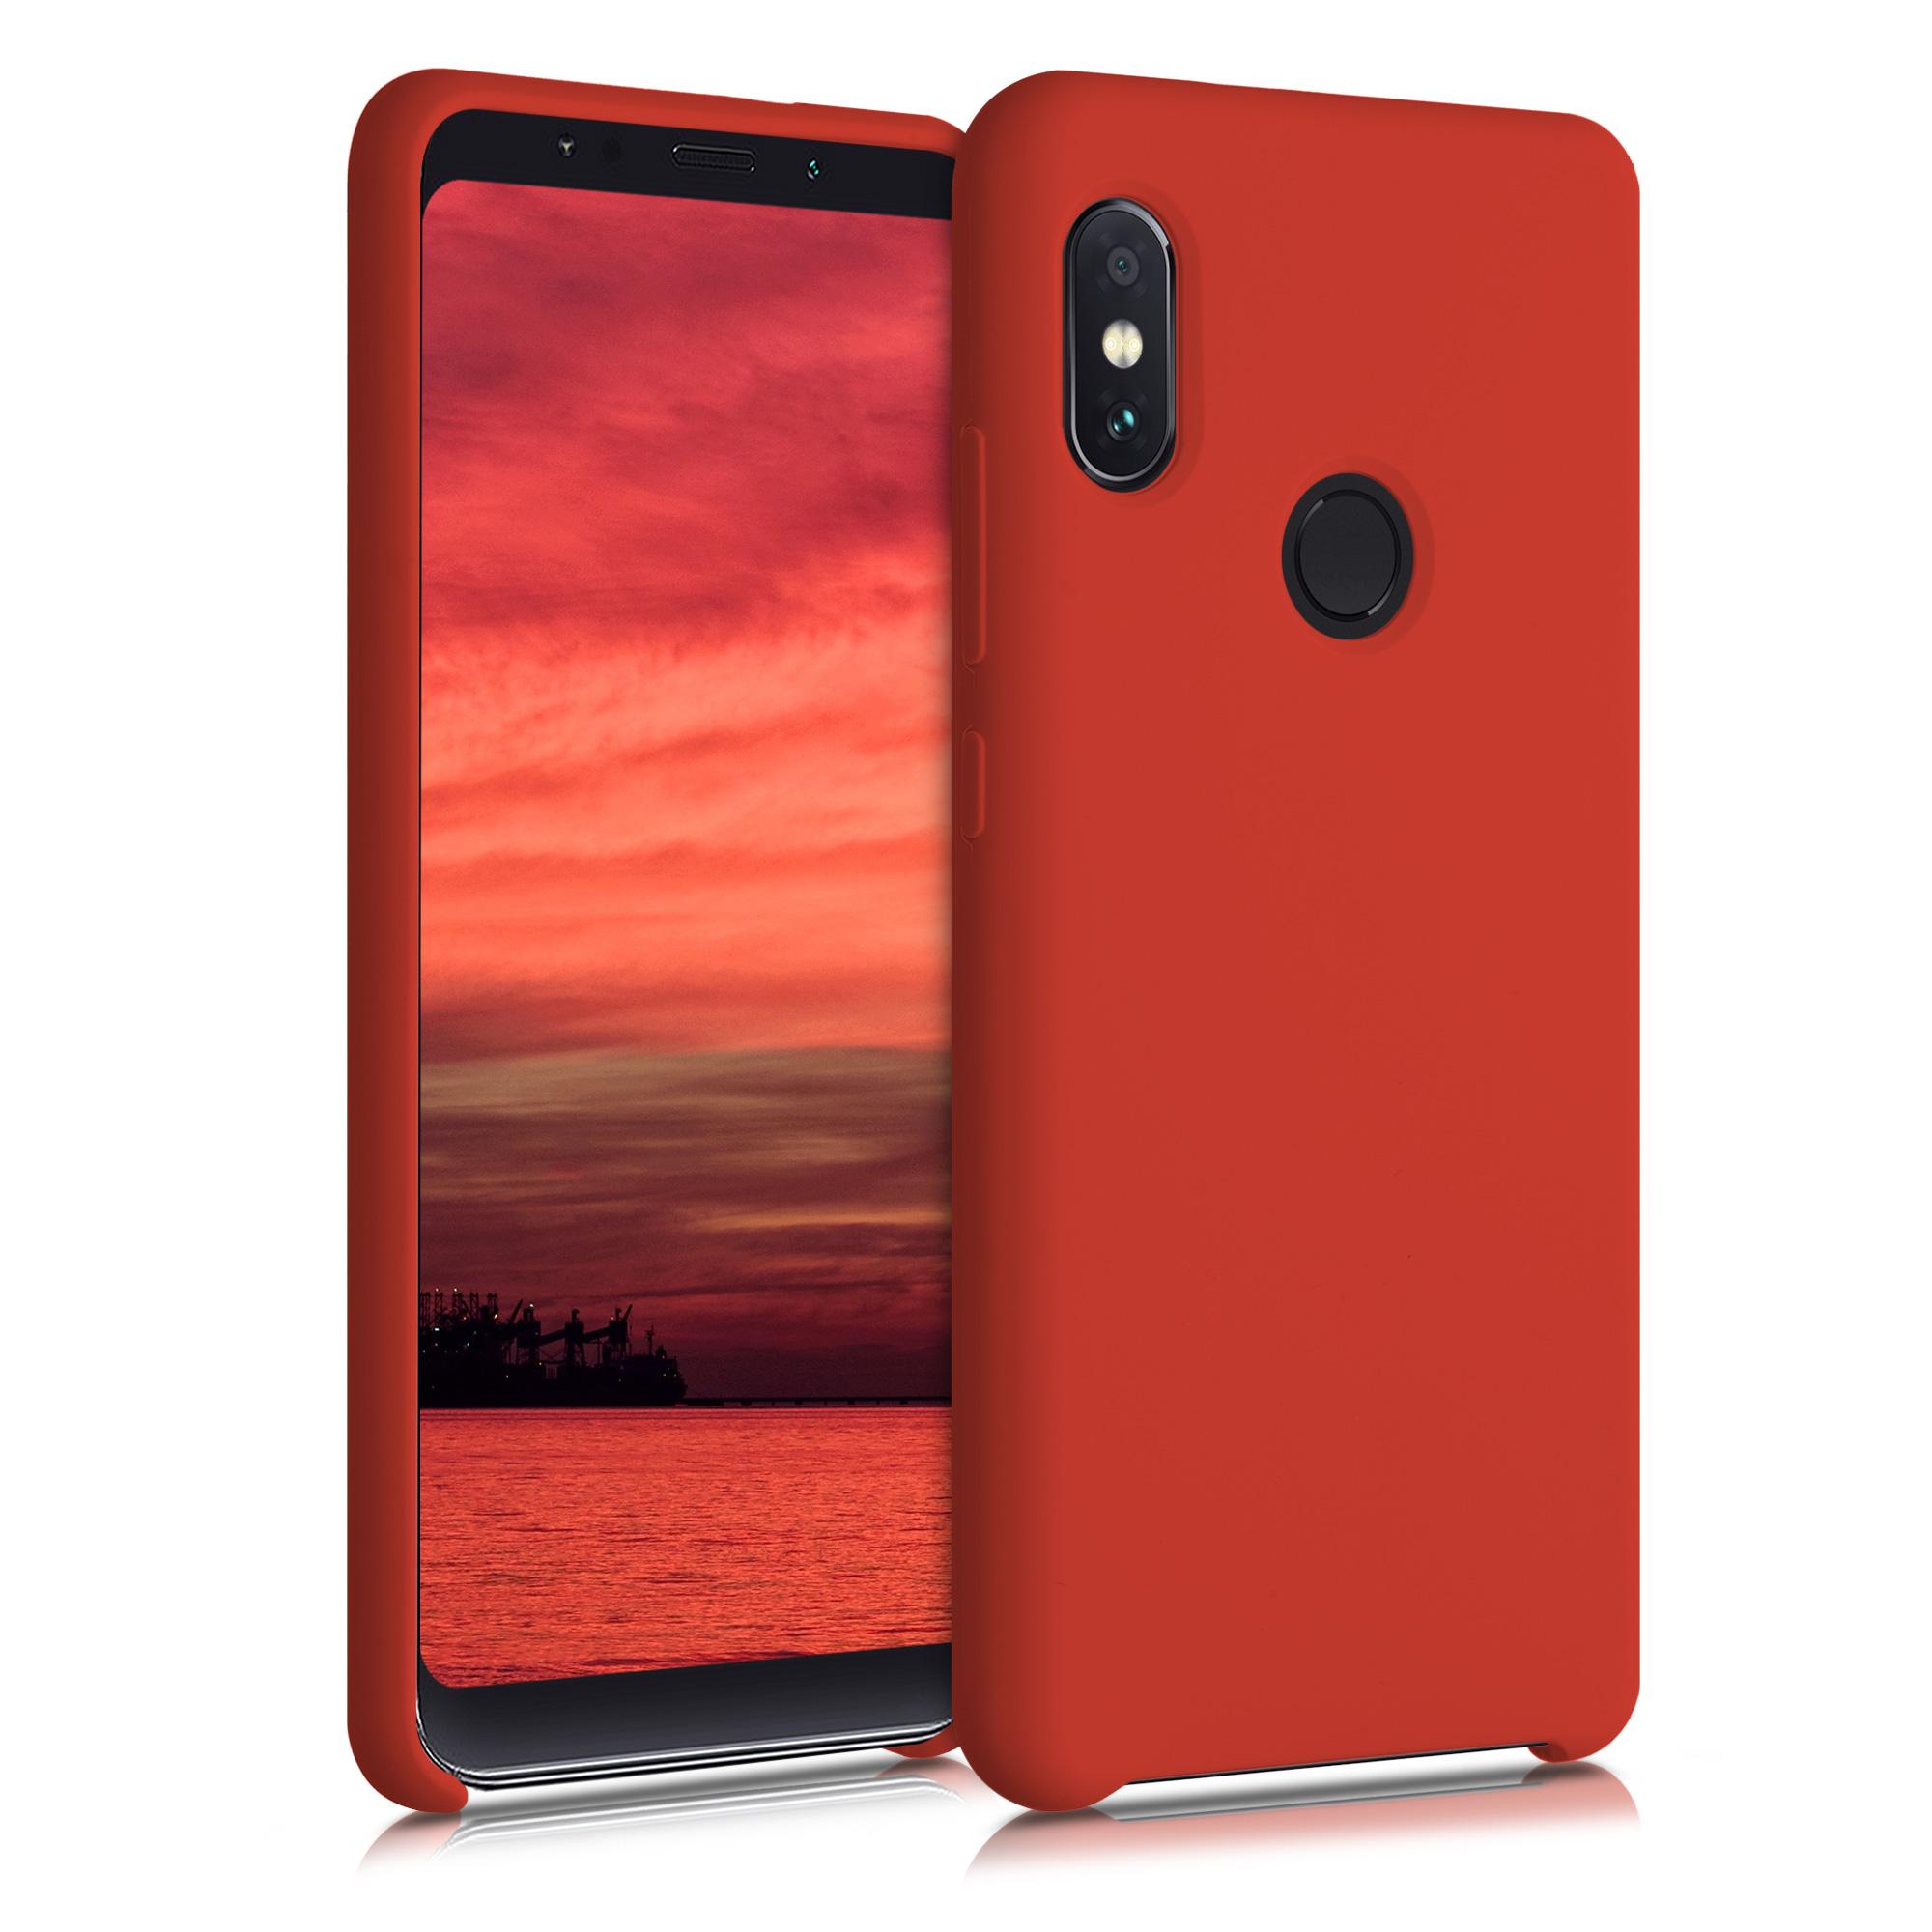 Kvalitní silikonové TPU pouzdro | obal pro Xiaomi Redmi Note 5 (Global Vers - červený matný